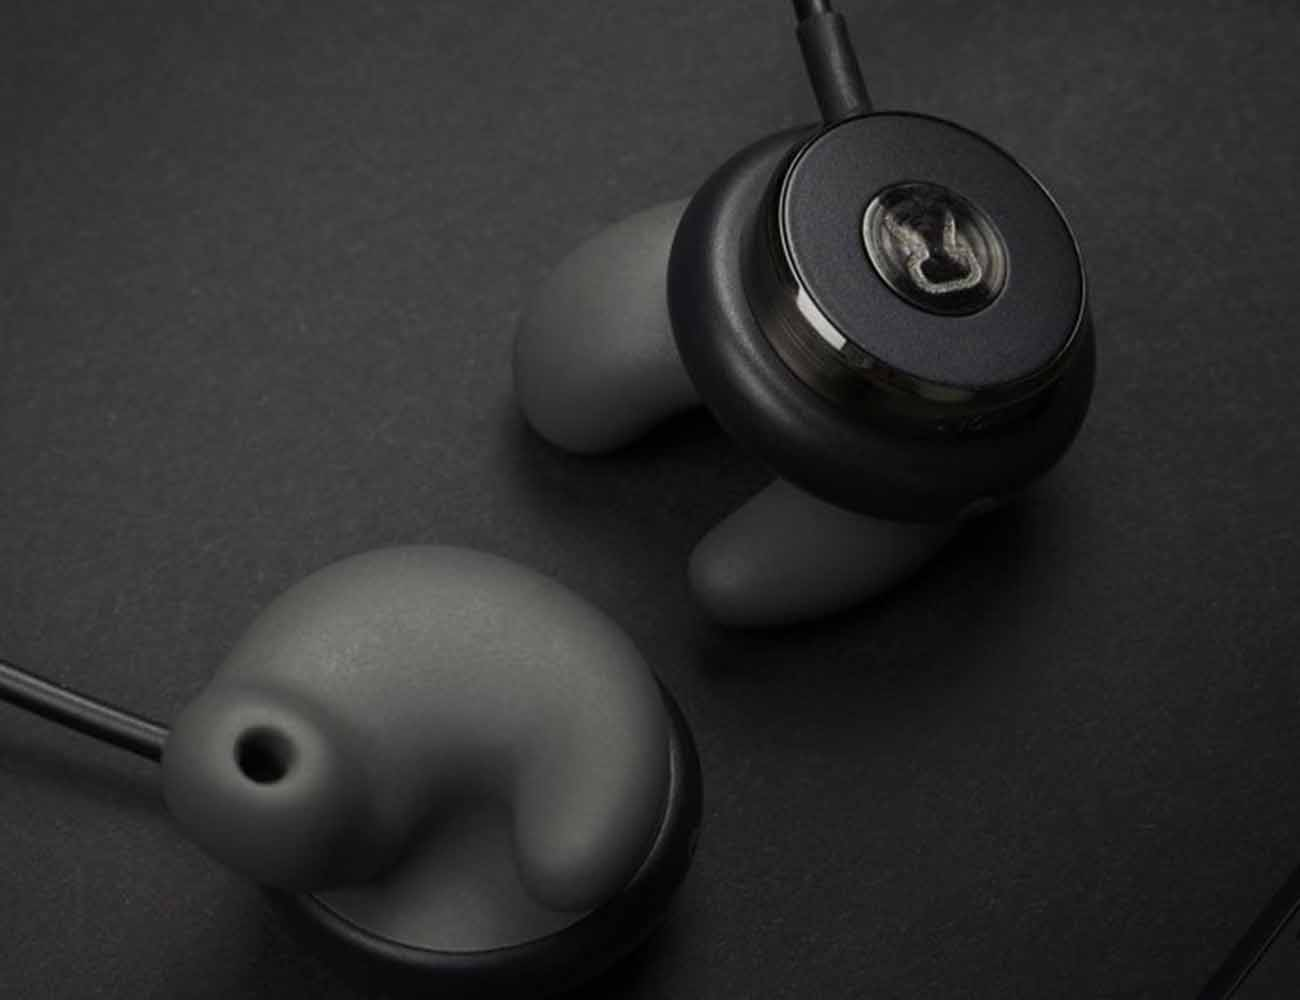 Revols – Premium Quick Custom Fit Wireless Earphones